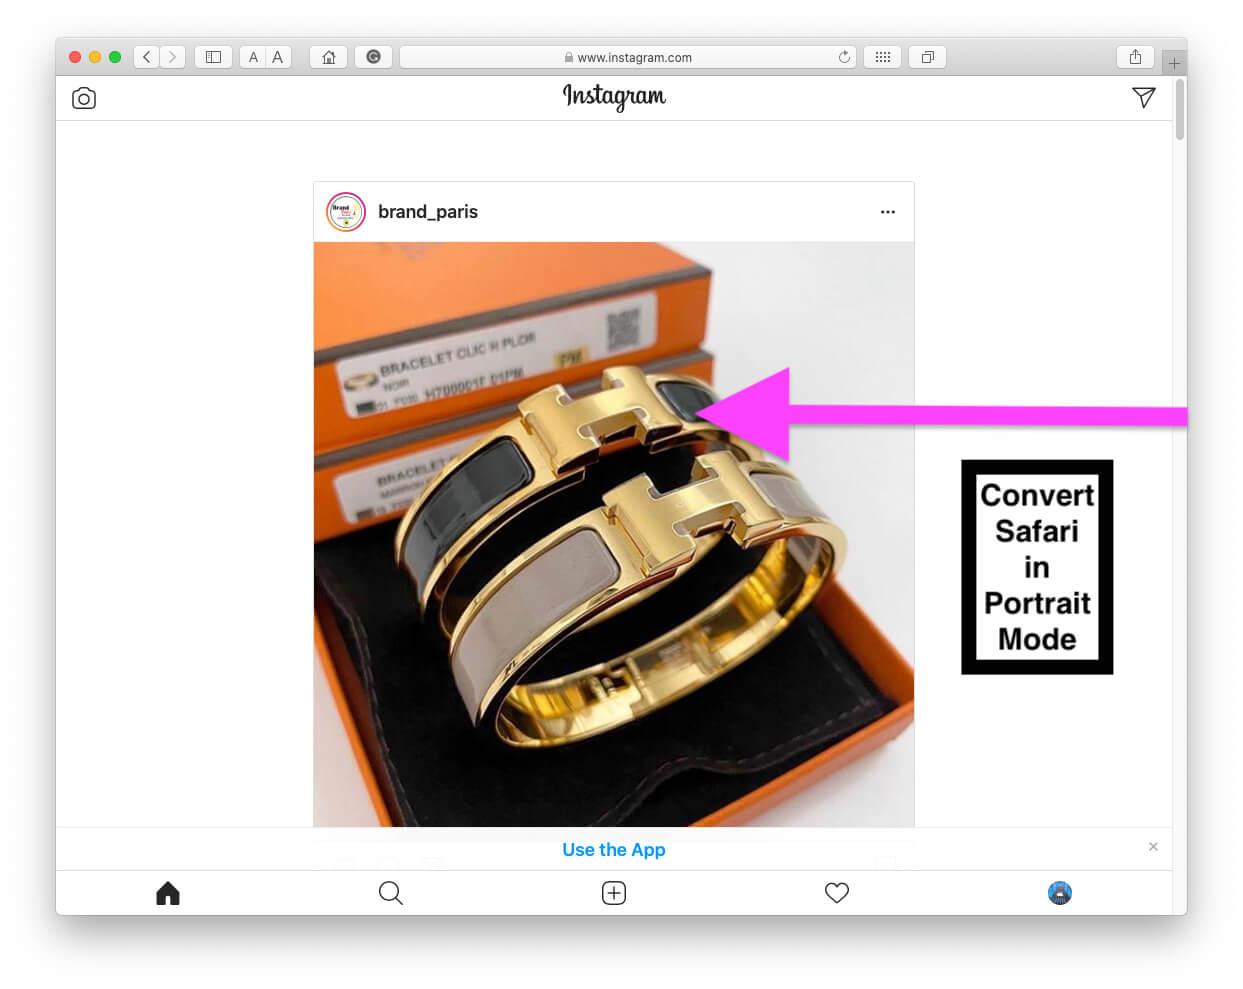 Instagram on Safari Mac full screen